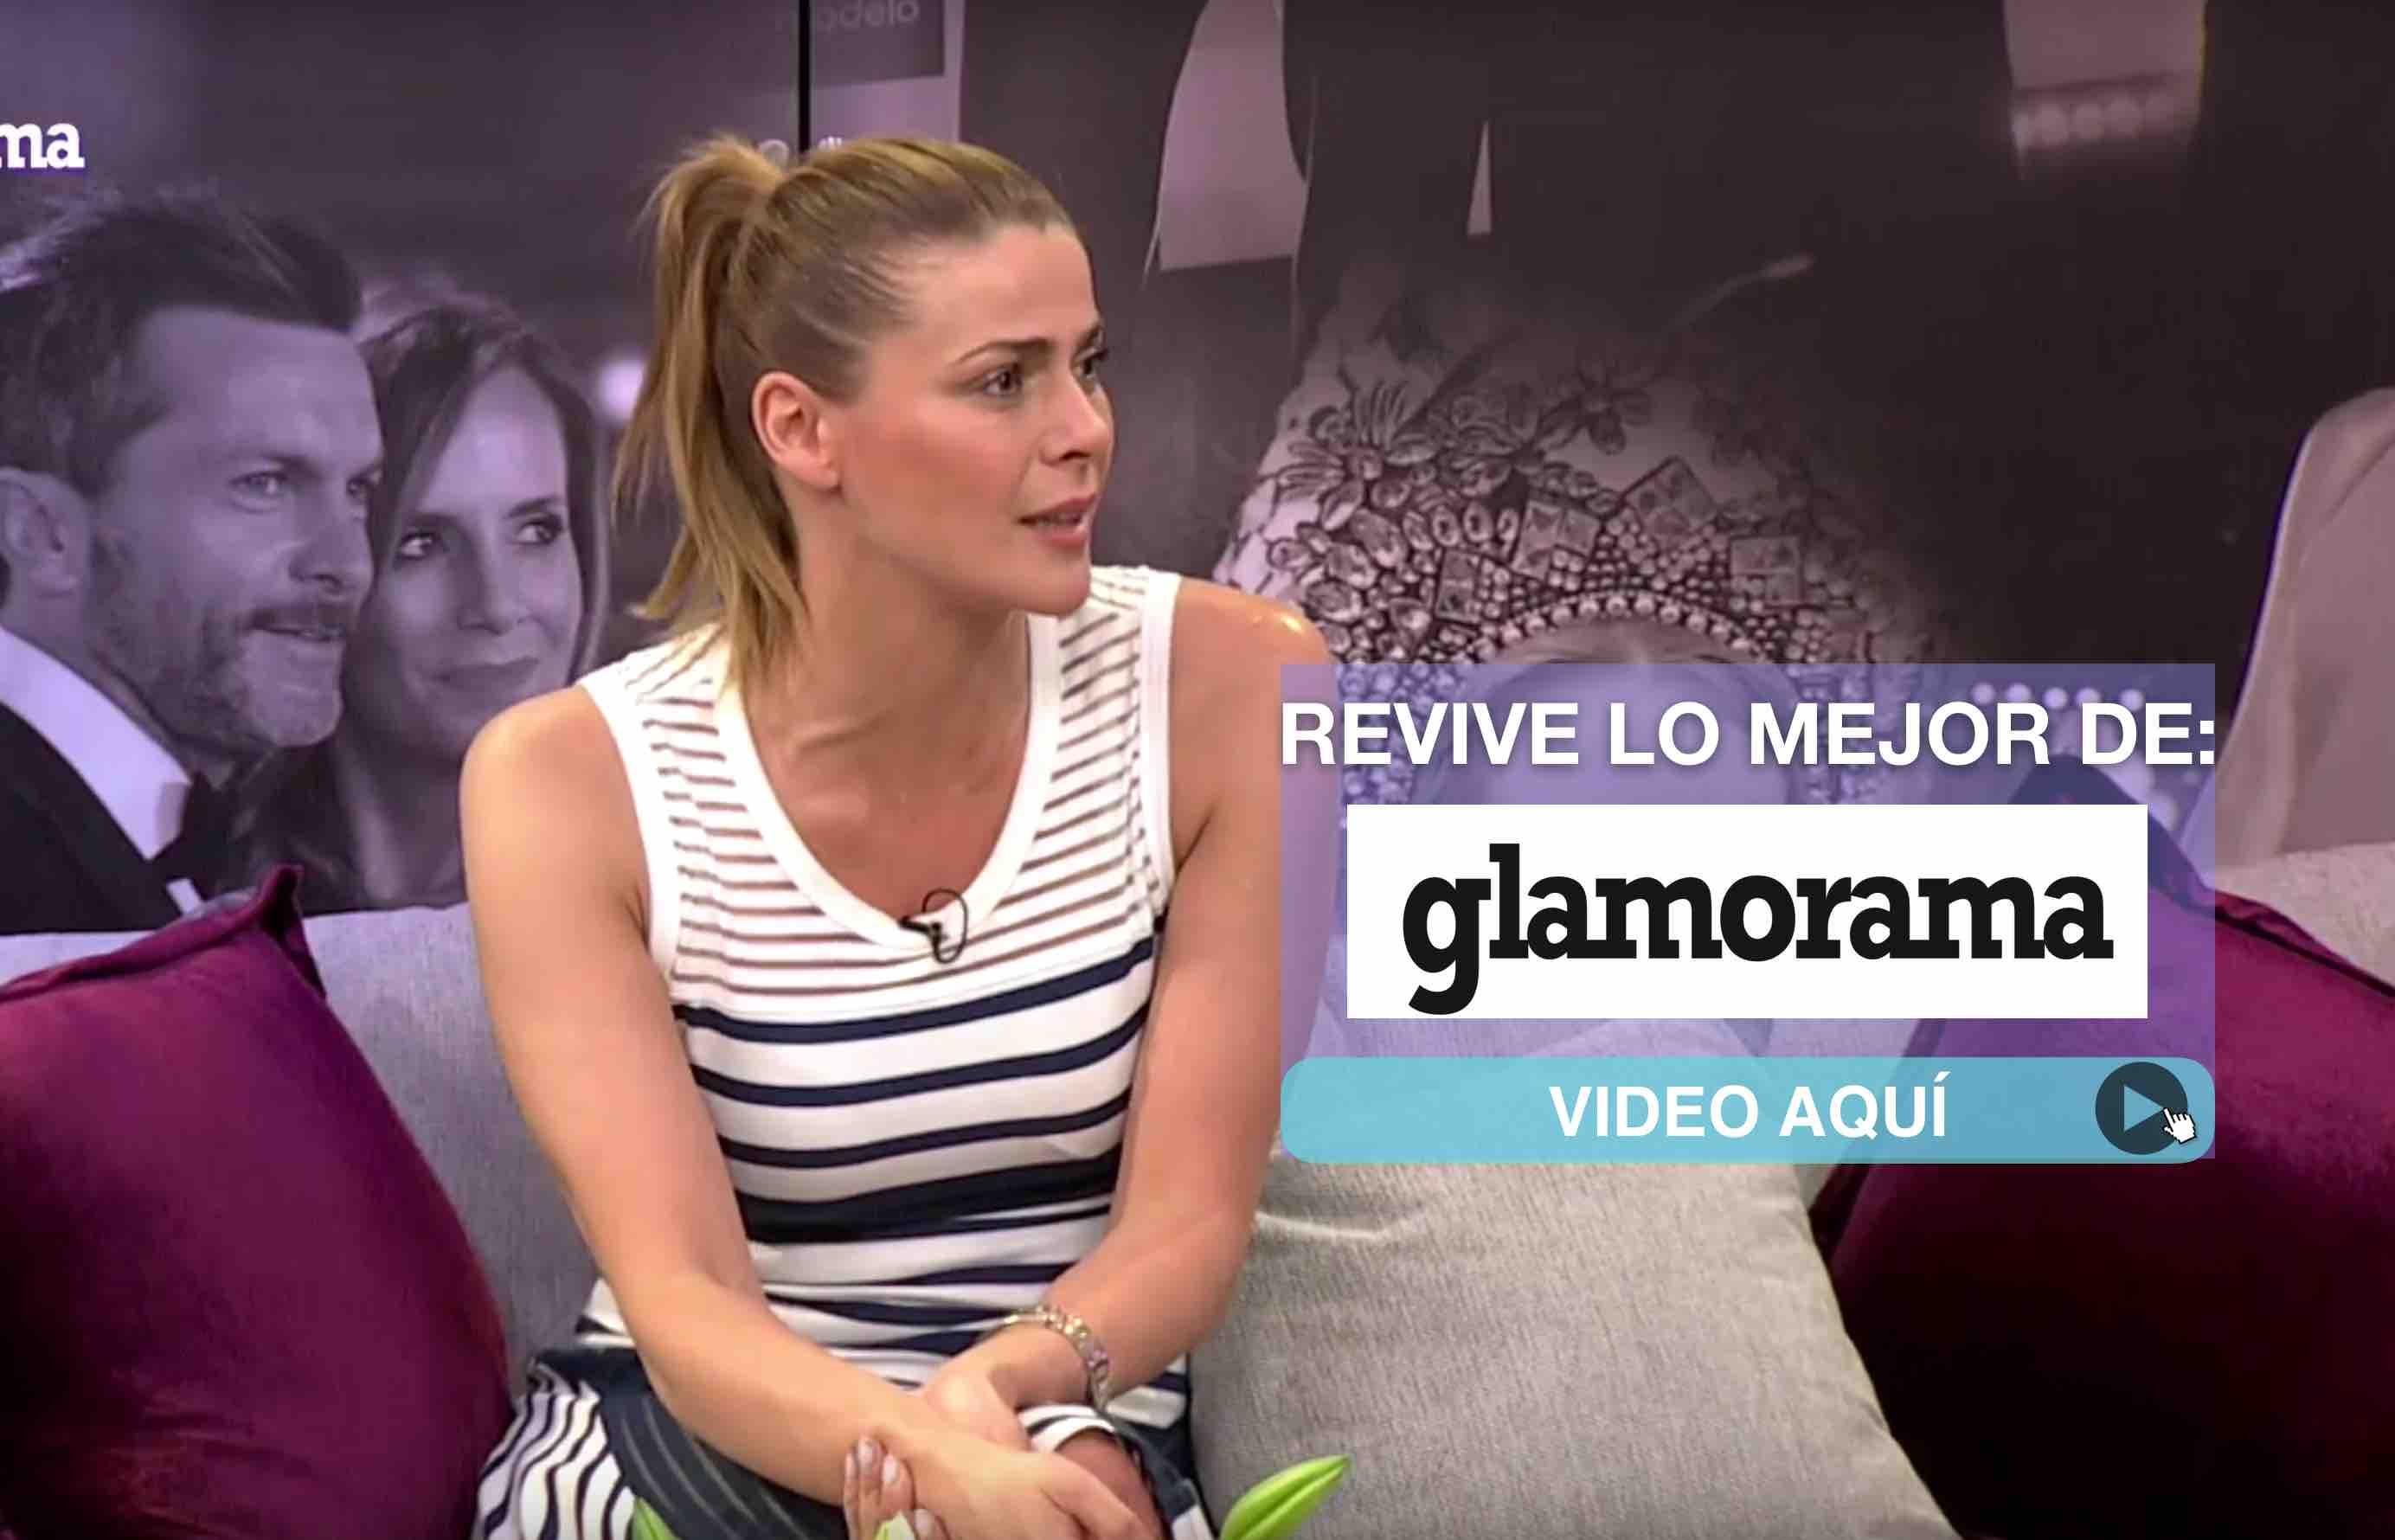 Glamorama sábados 21:00 horas por Vive de VTR